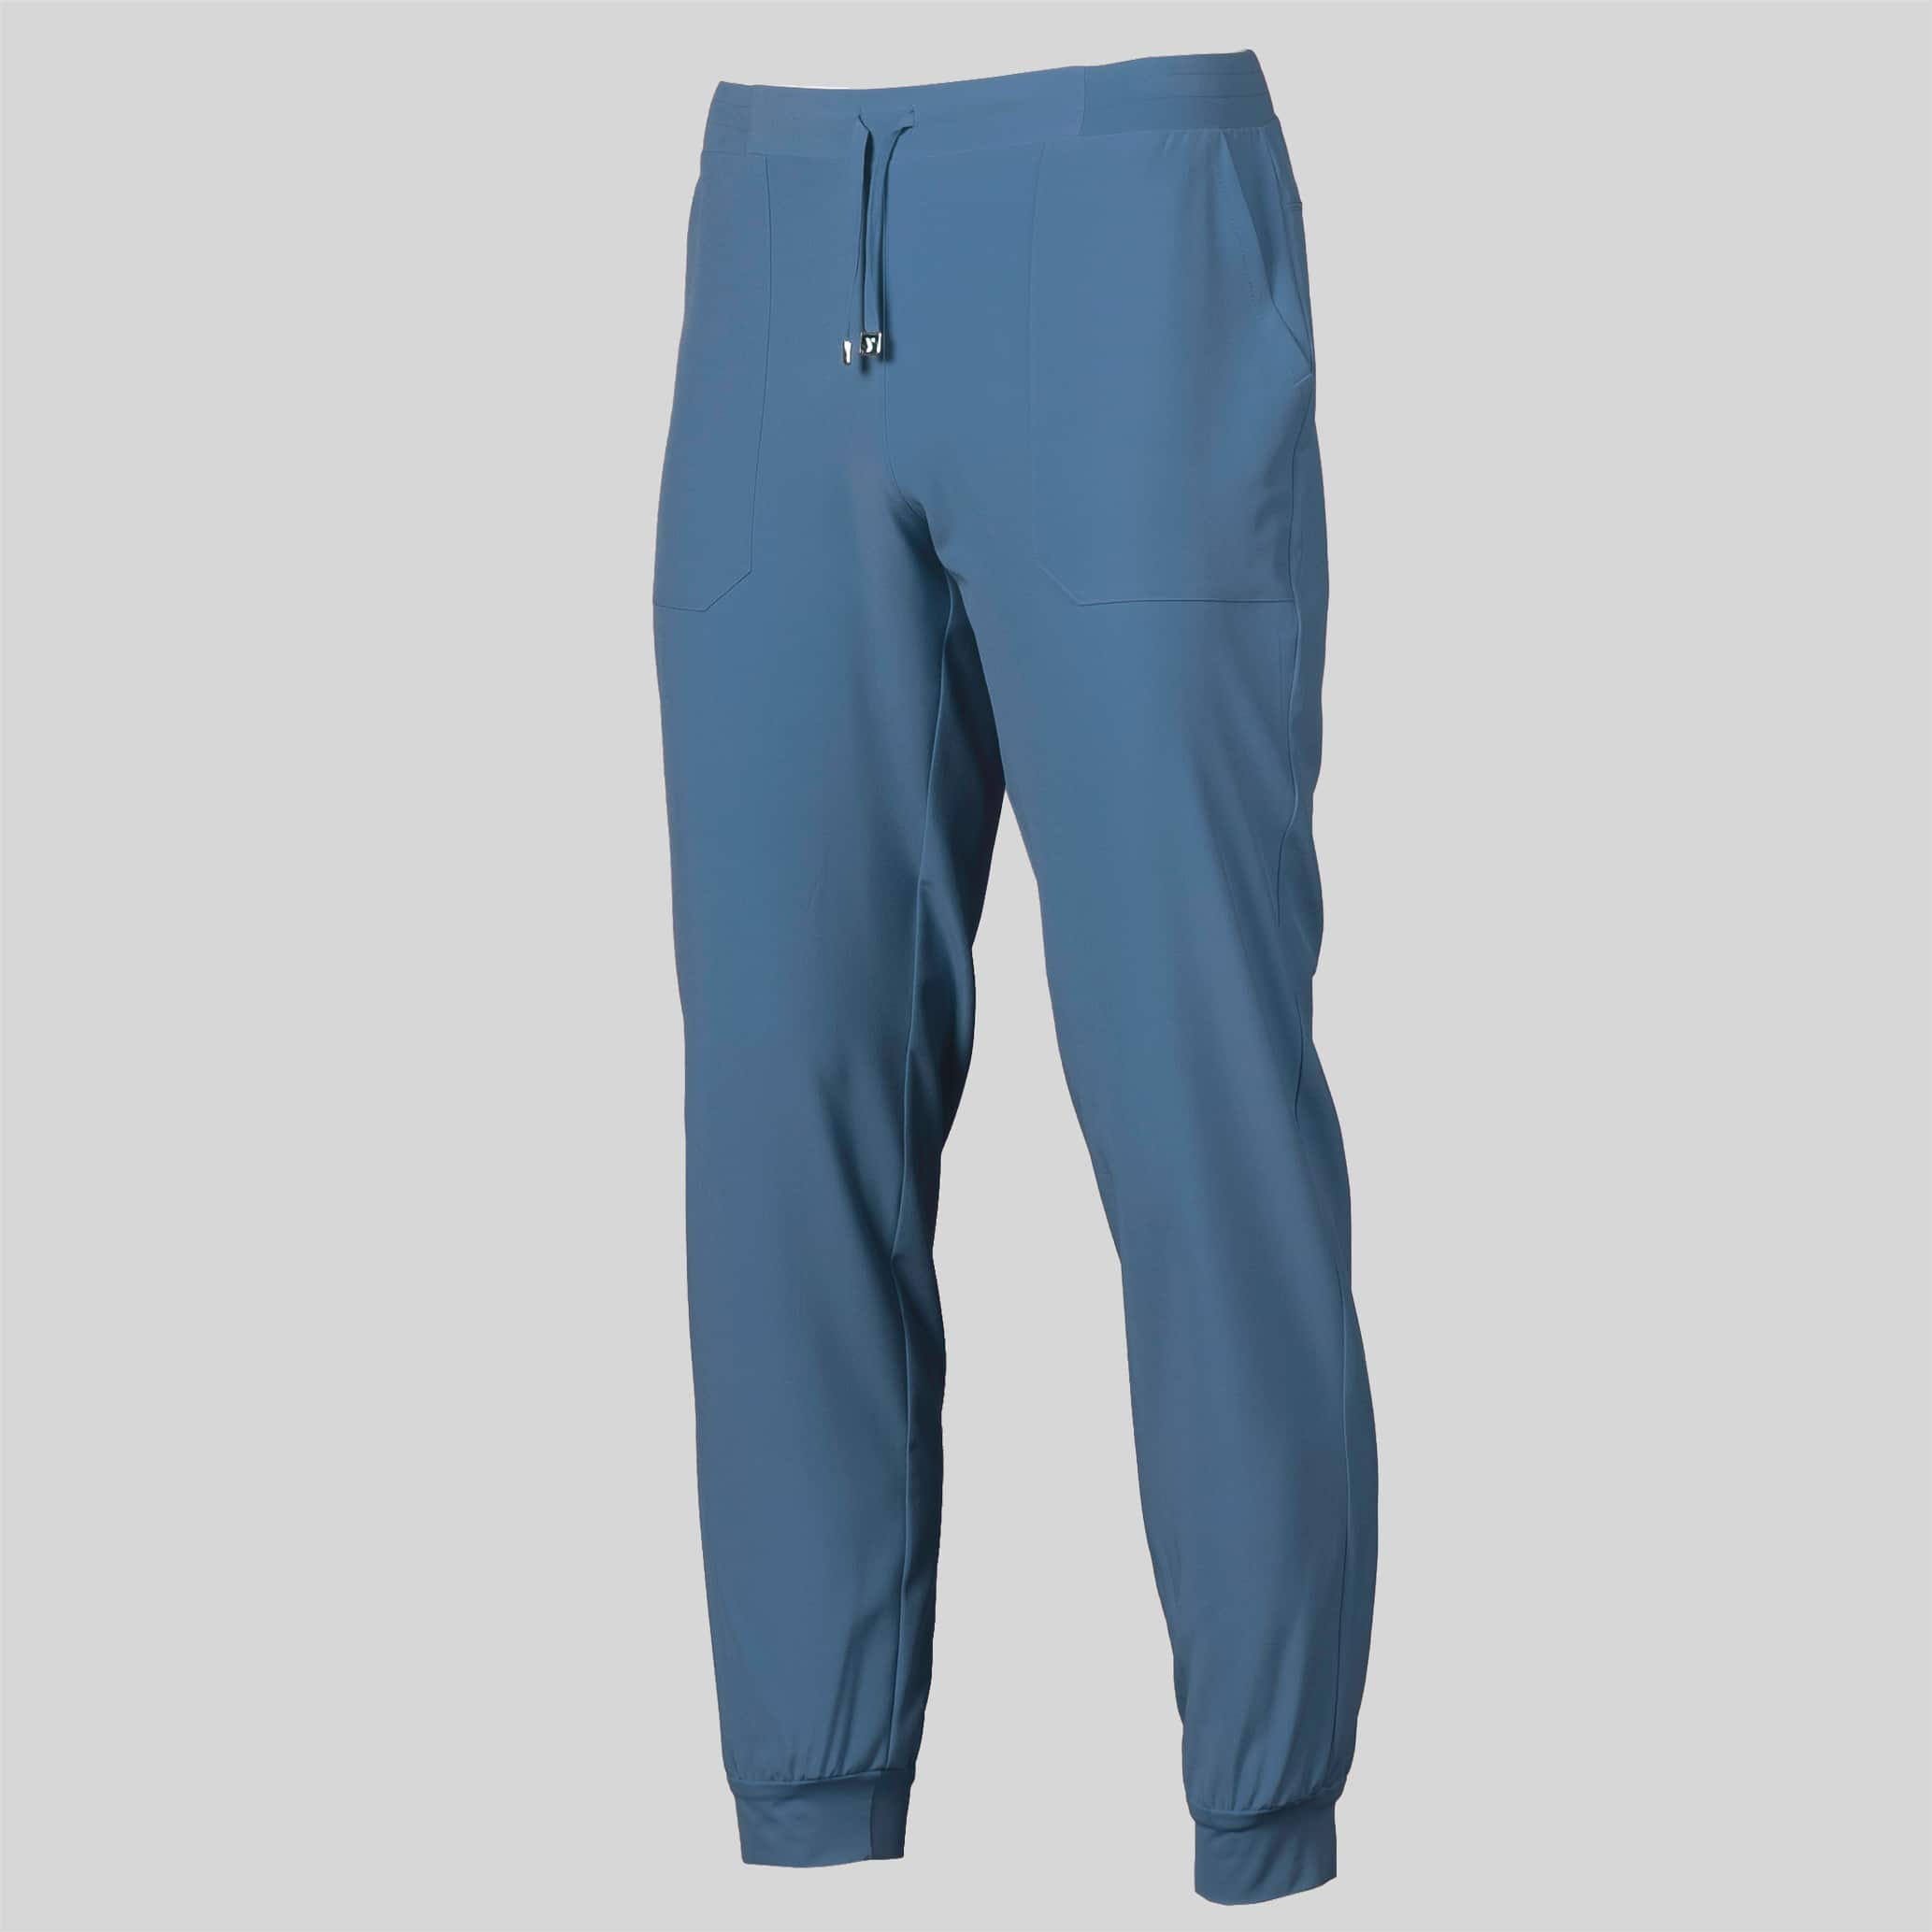 Gary´s 704700 Pantalon Unisex Jogger Azul GrisÁceo